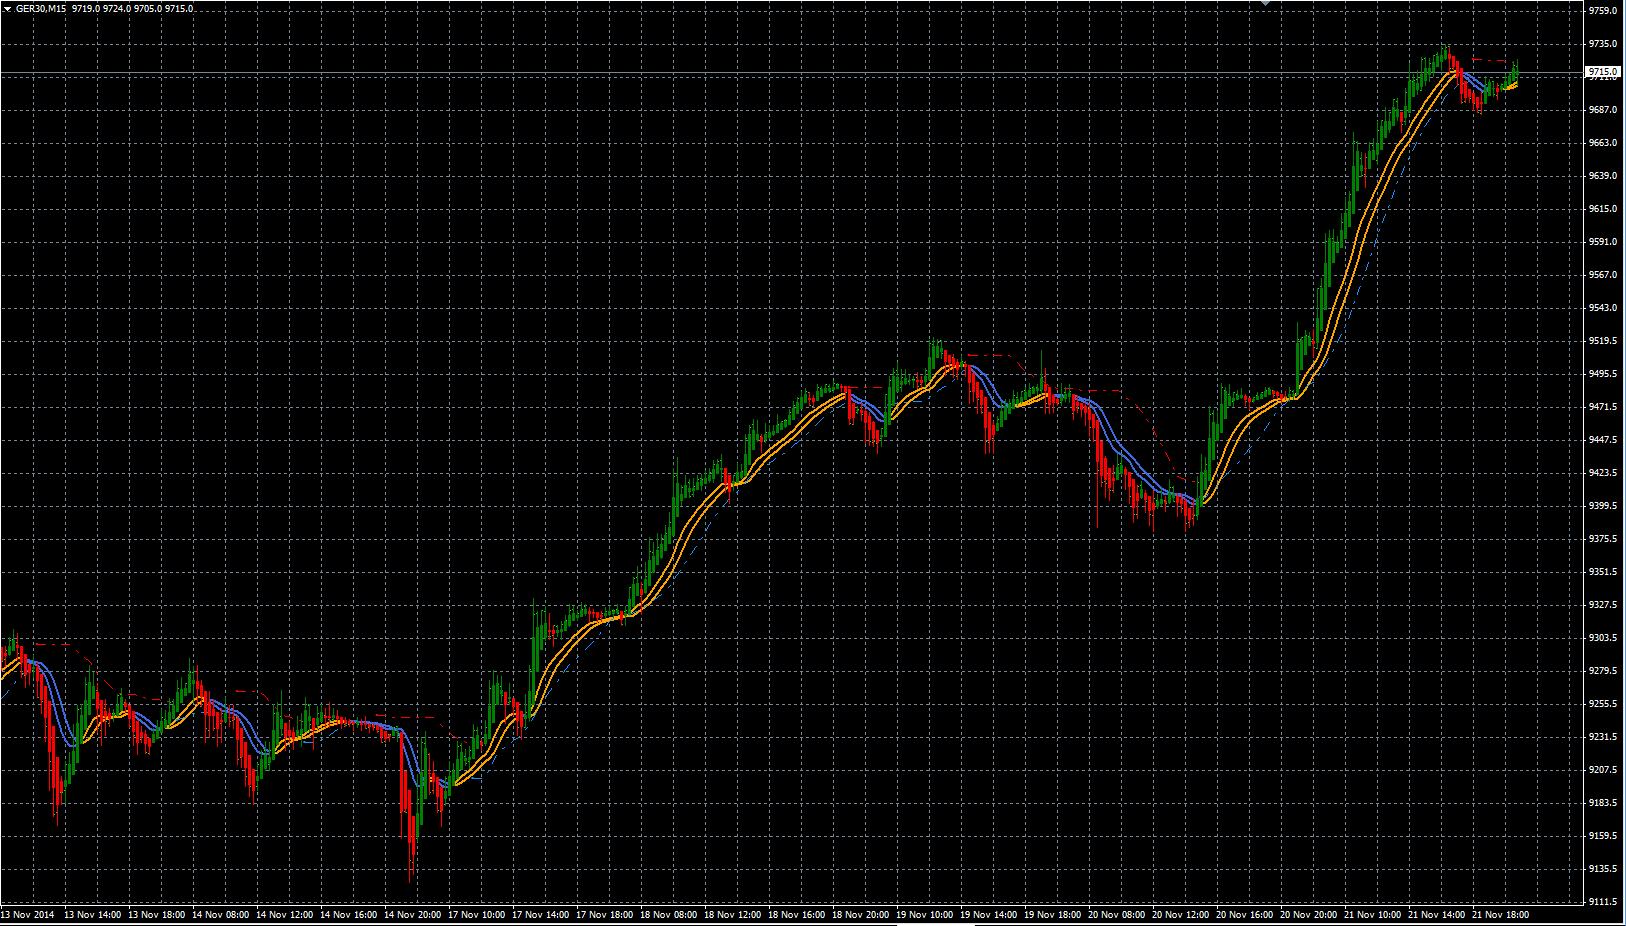 DAX 30m trading 2014 11 21